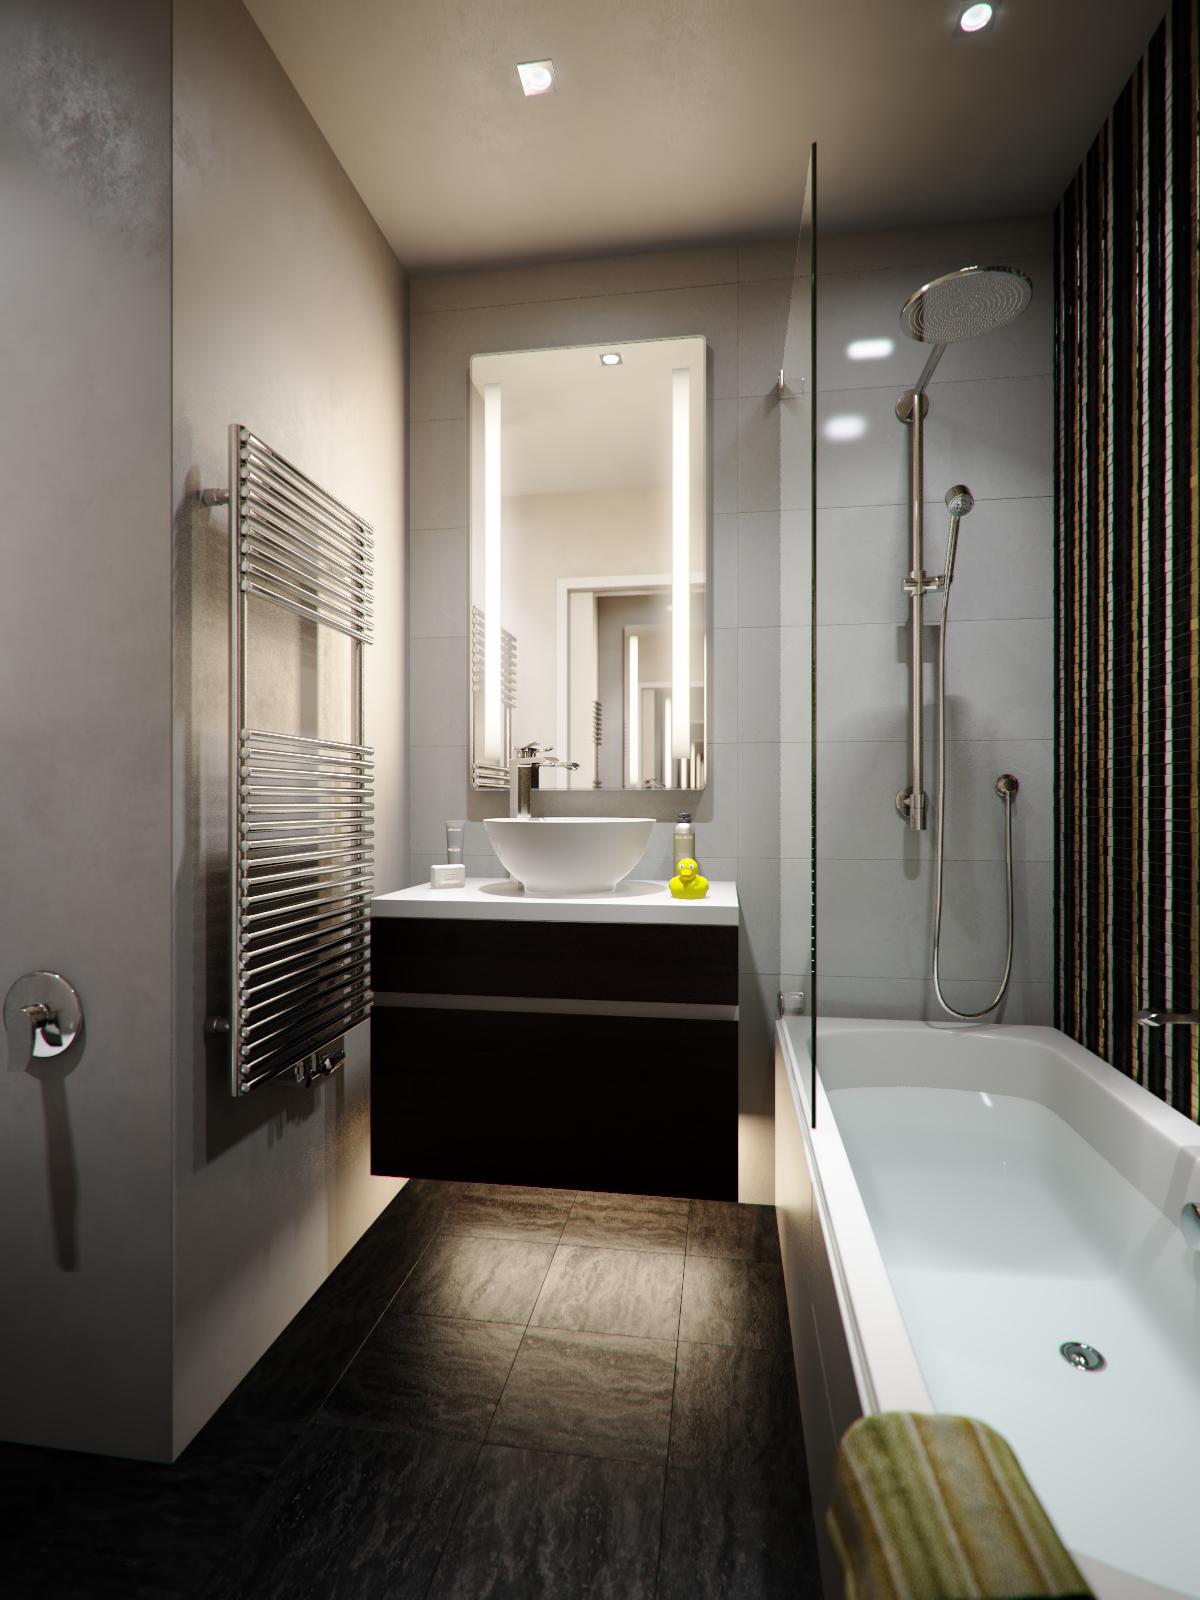 Modern and minimalist bathroom design